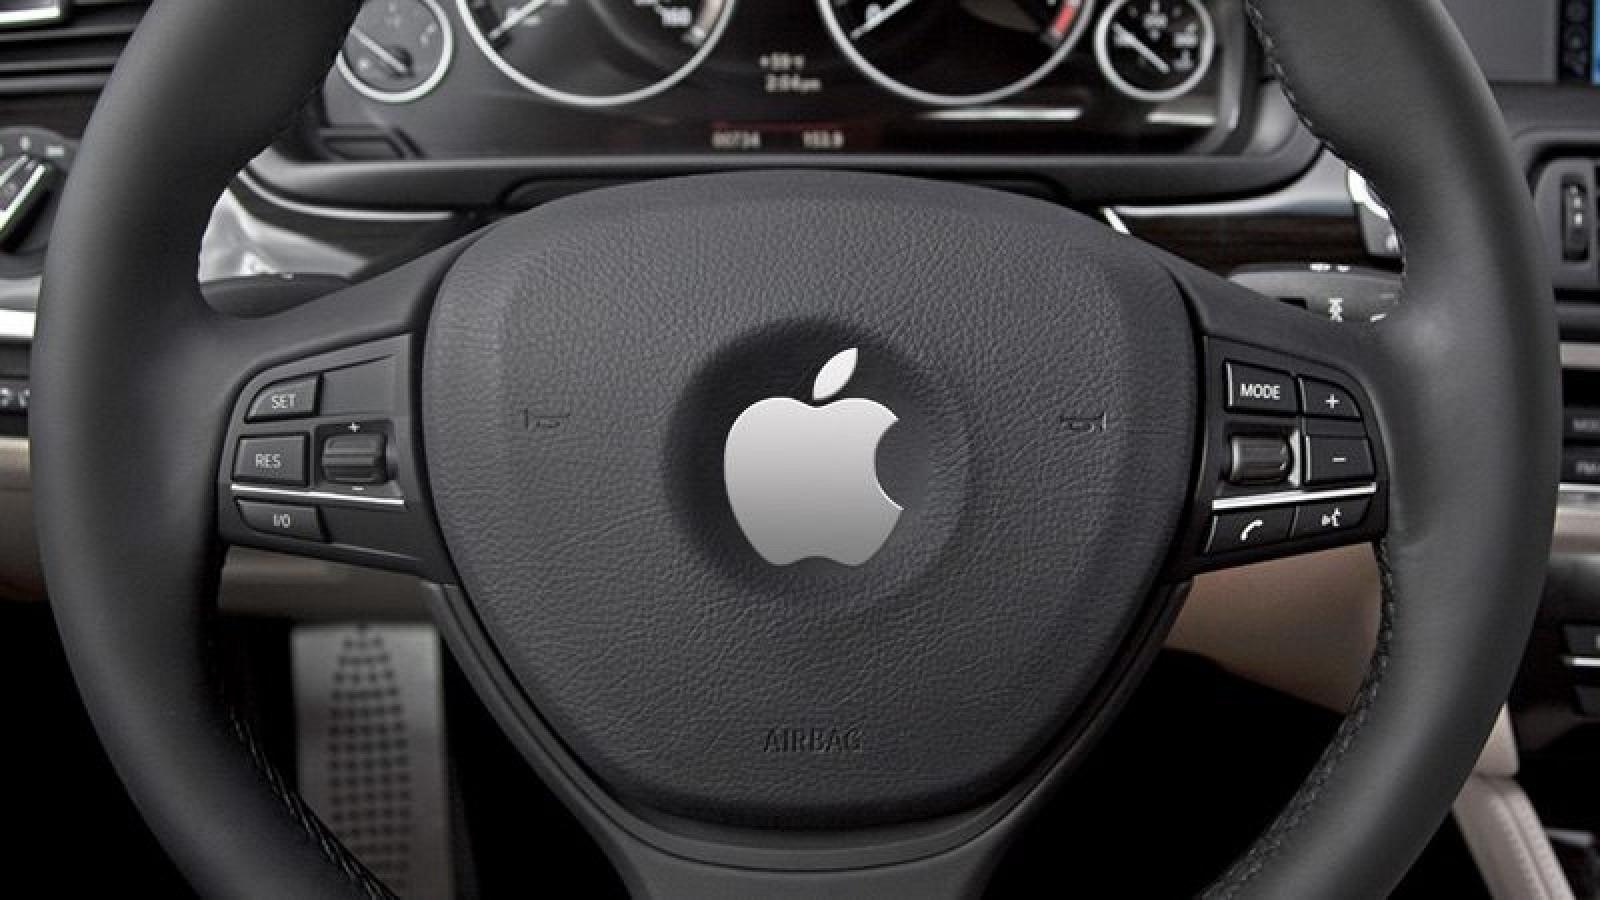 Image result for apple car